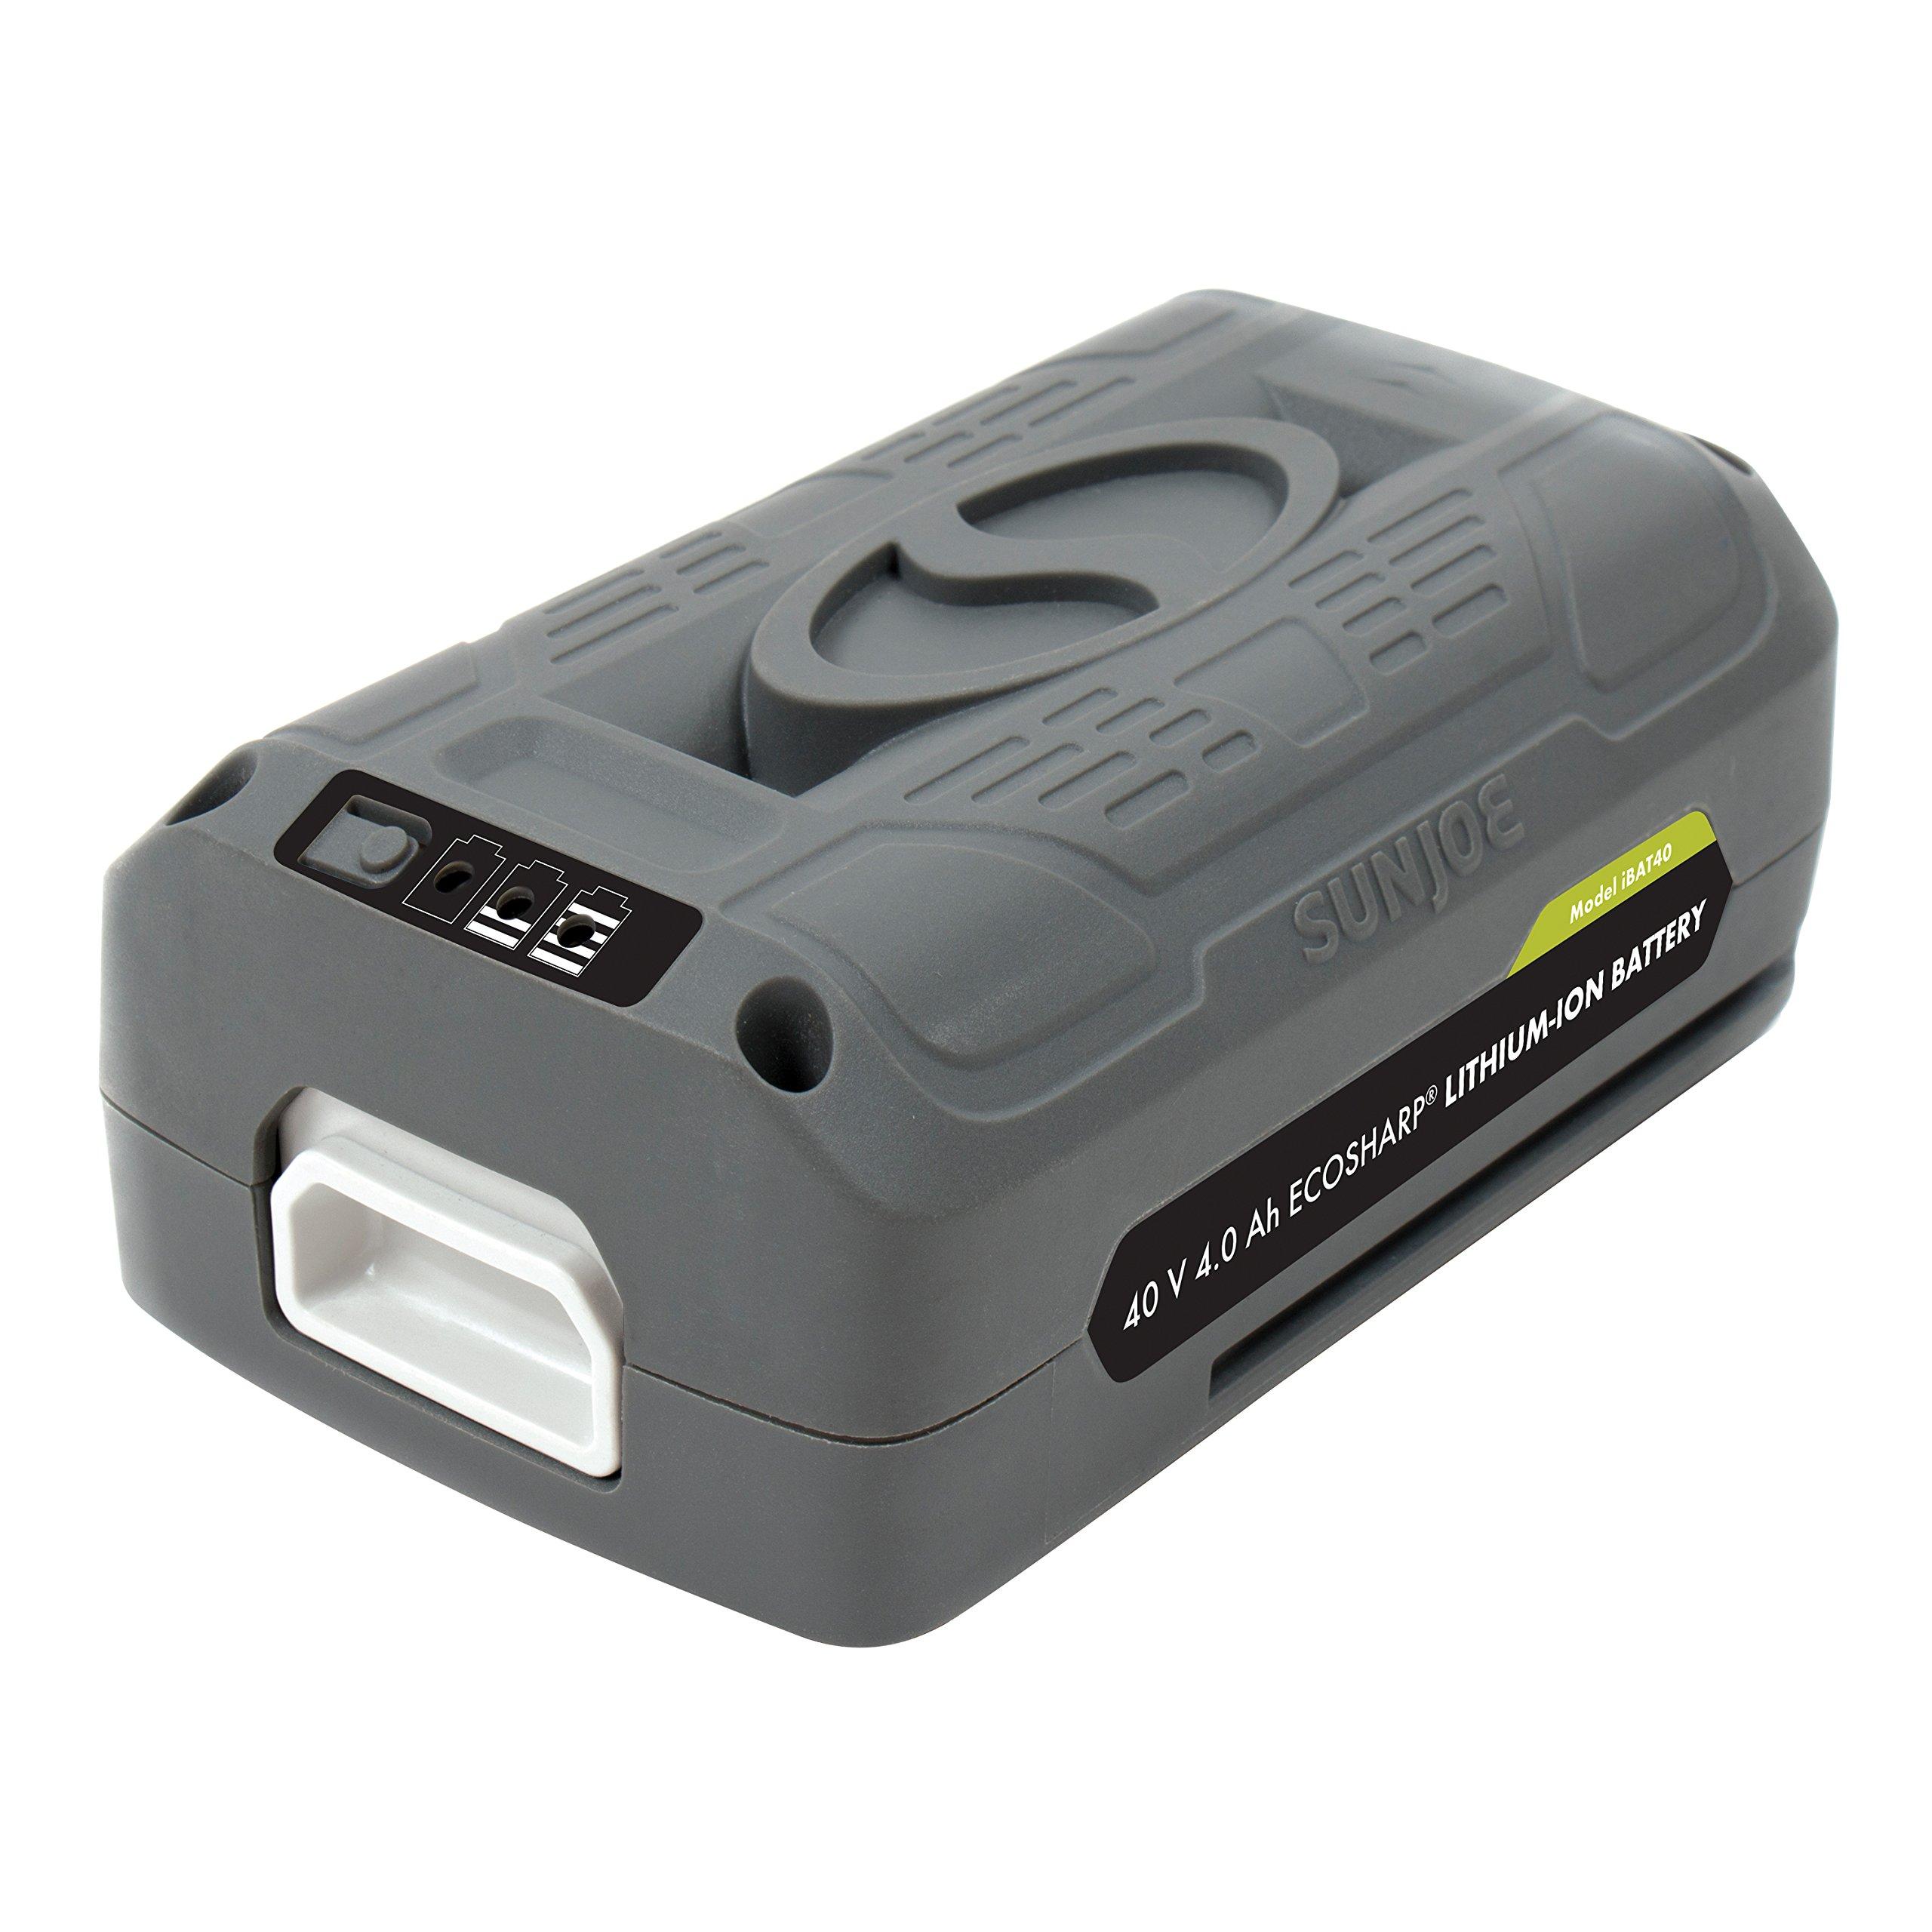 Snow Joe + Sun Joe iONMAX iBAT40 EcoSharp Lithium-Ion Battery | 40 Volt | 4.0 Ah product image